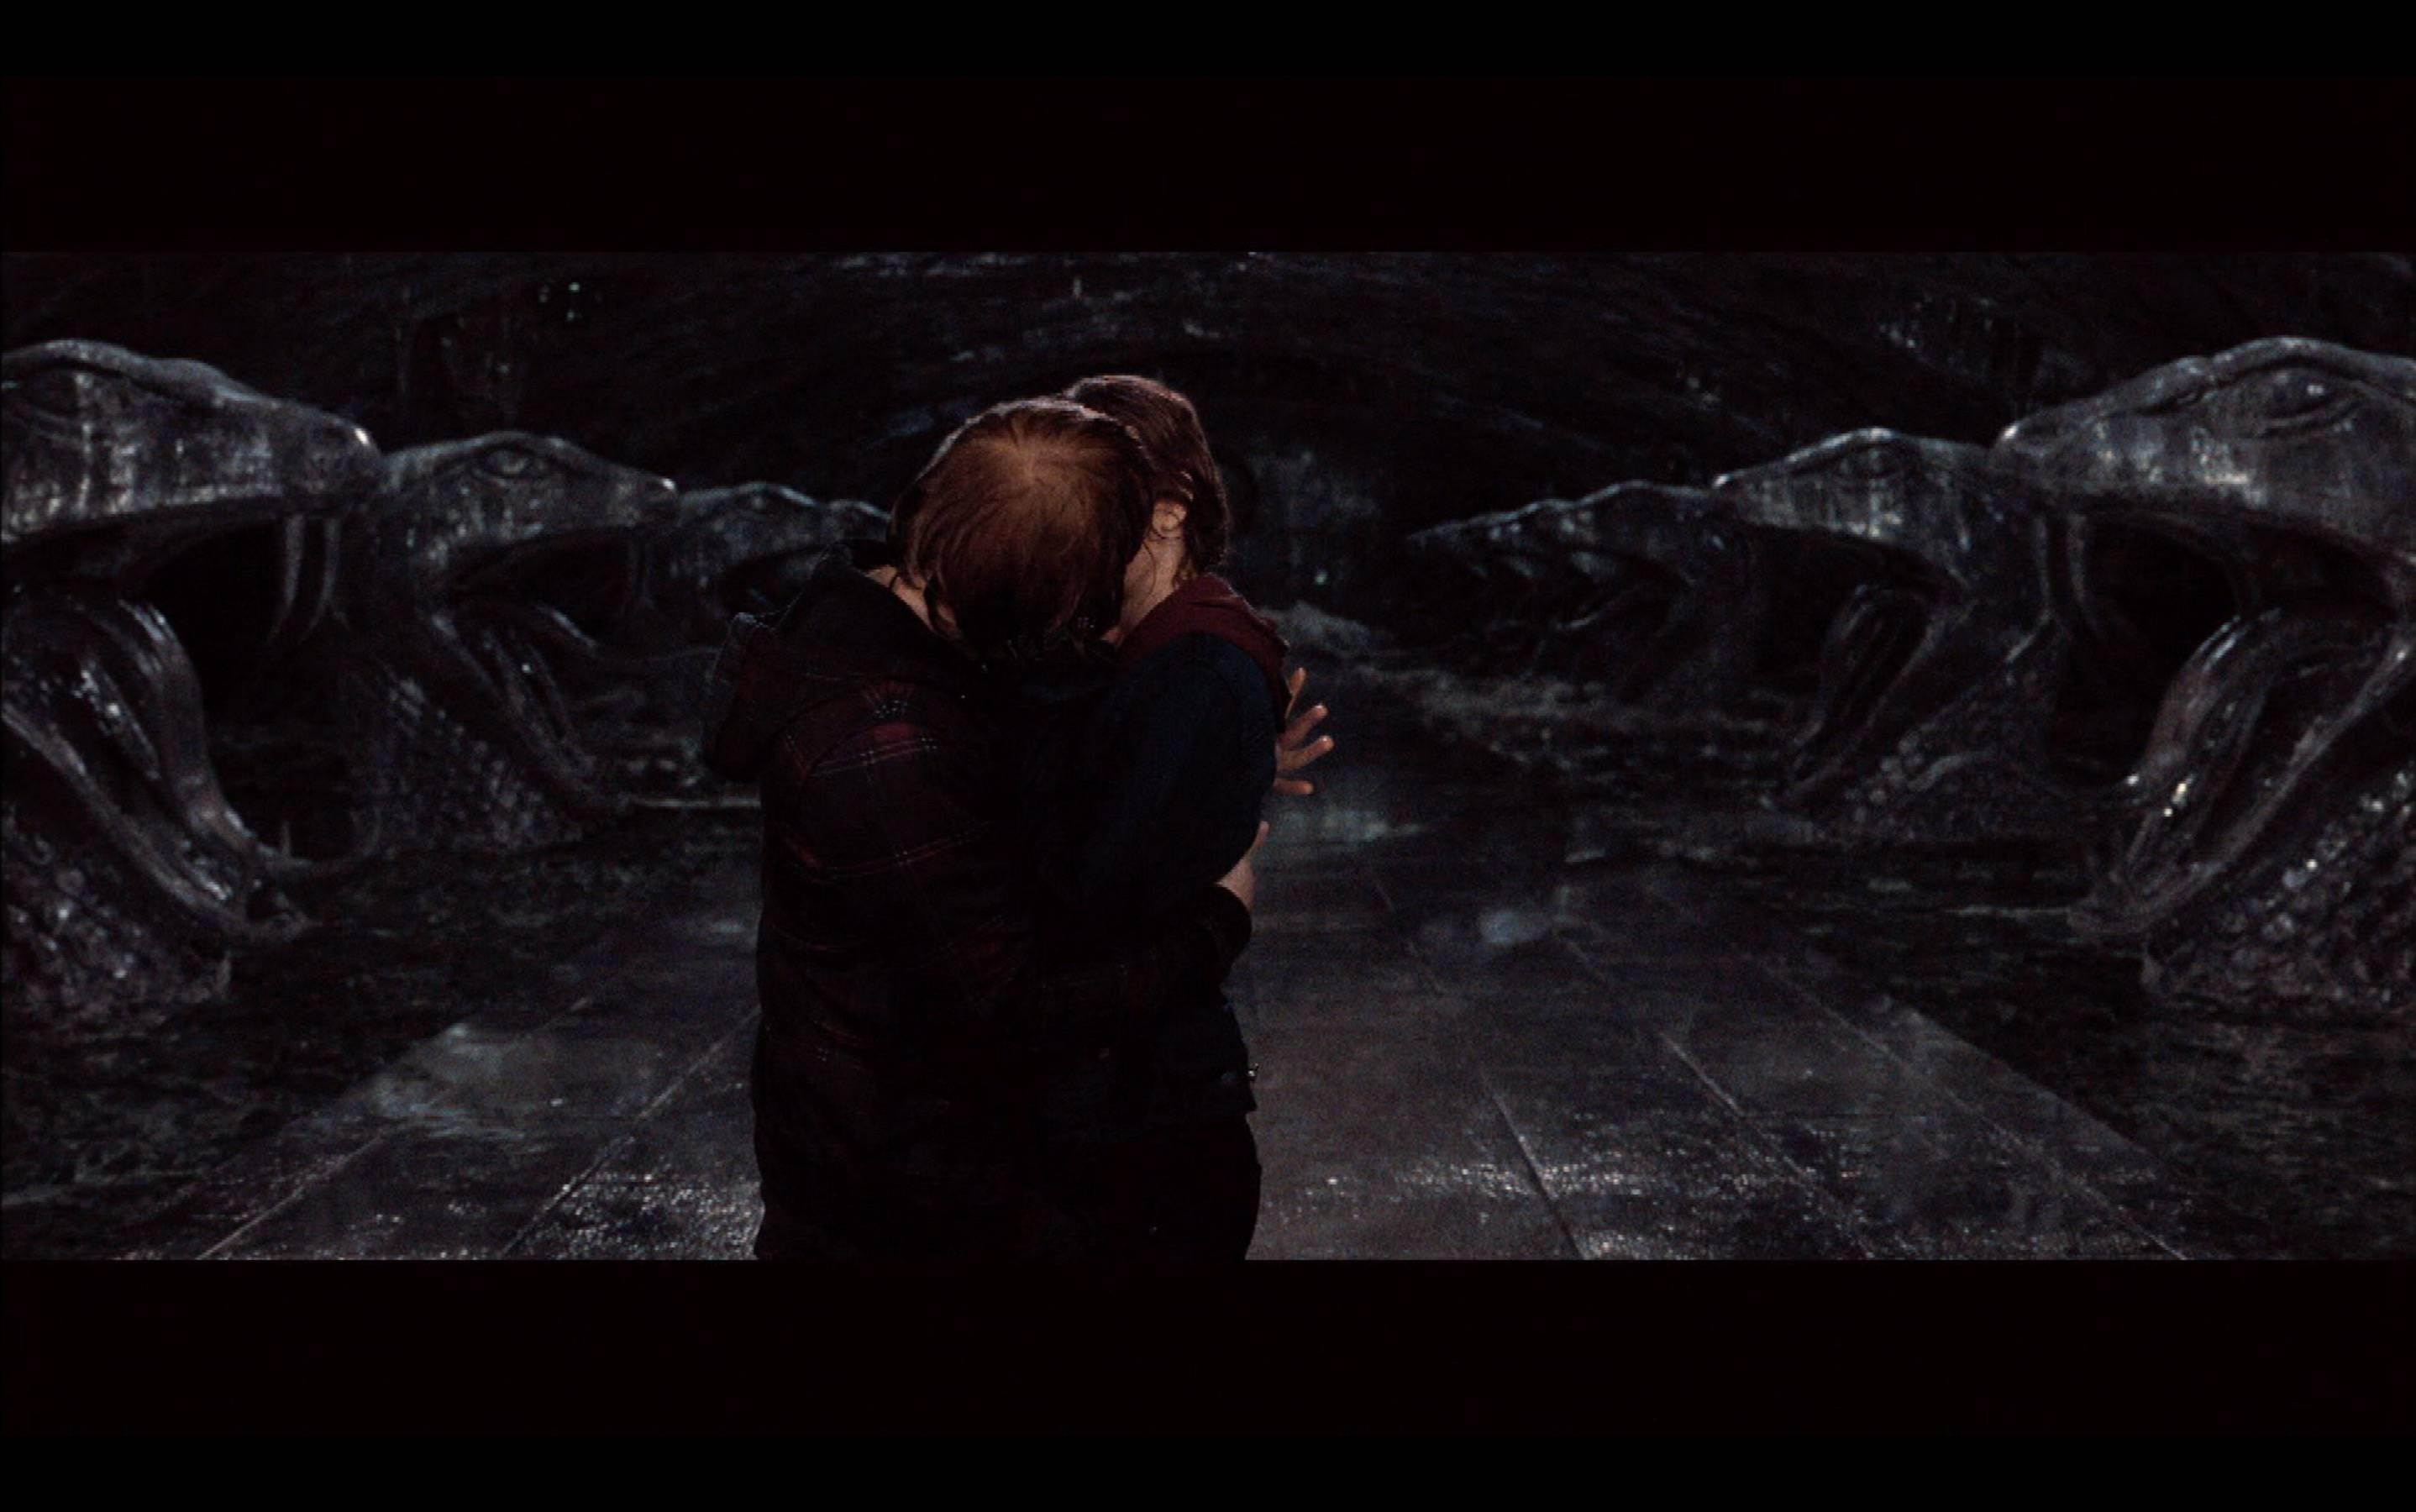 Best Kiss - 2012 Movie Awards